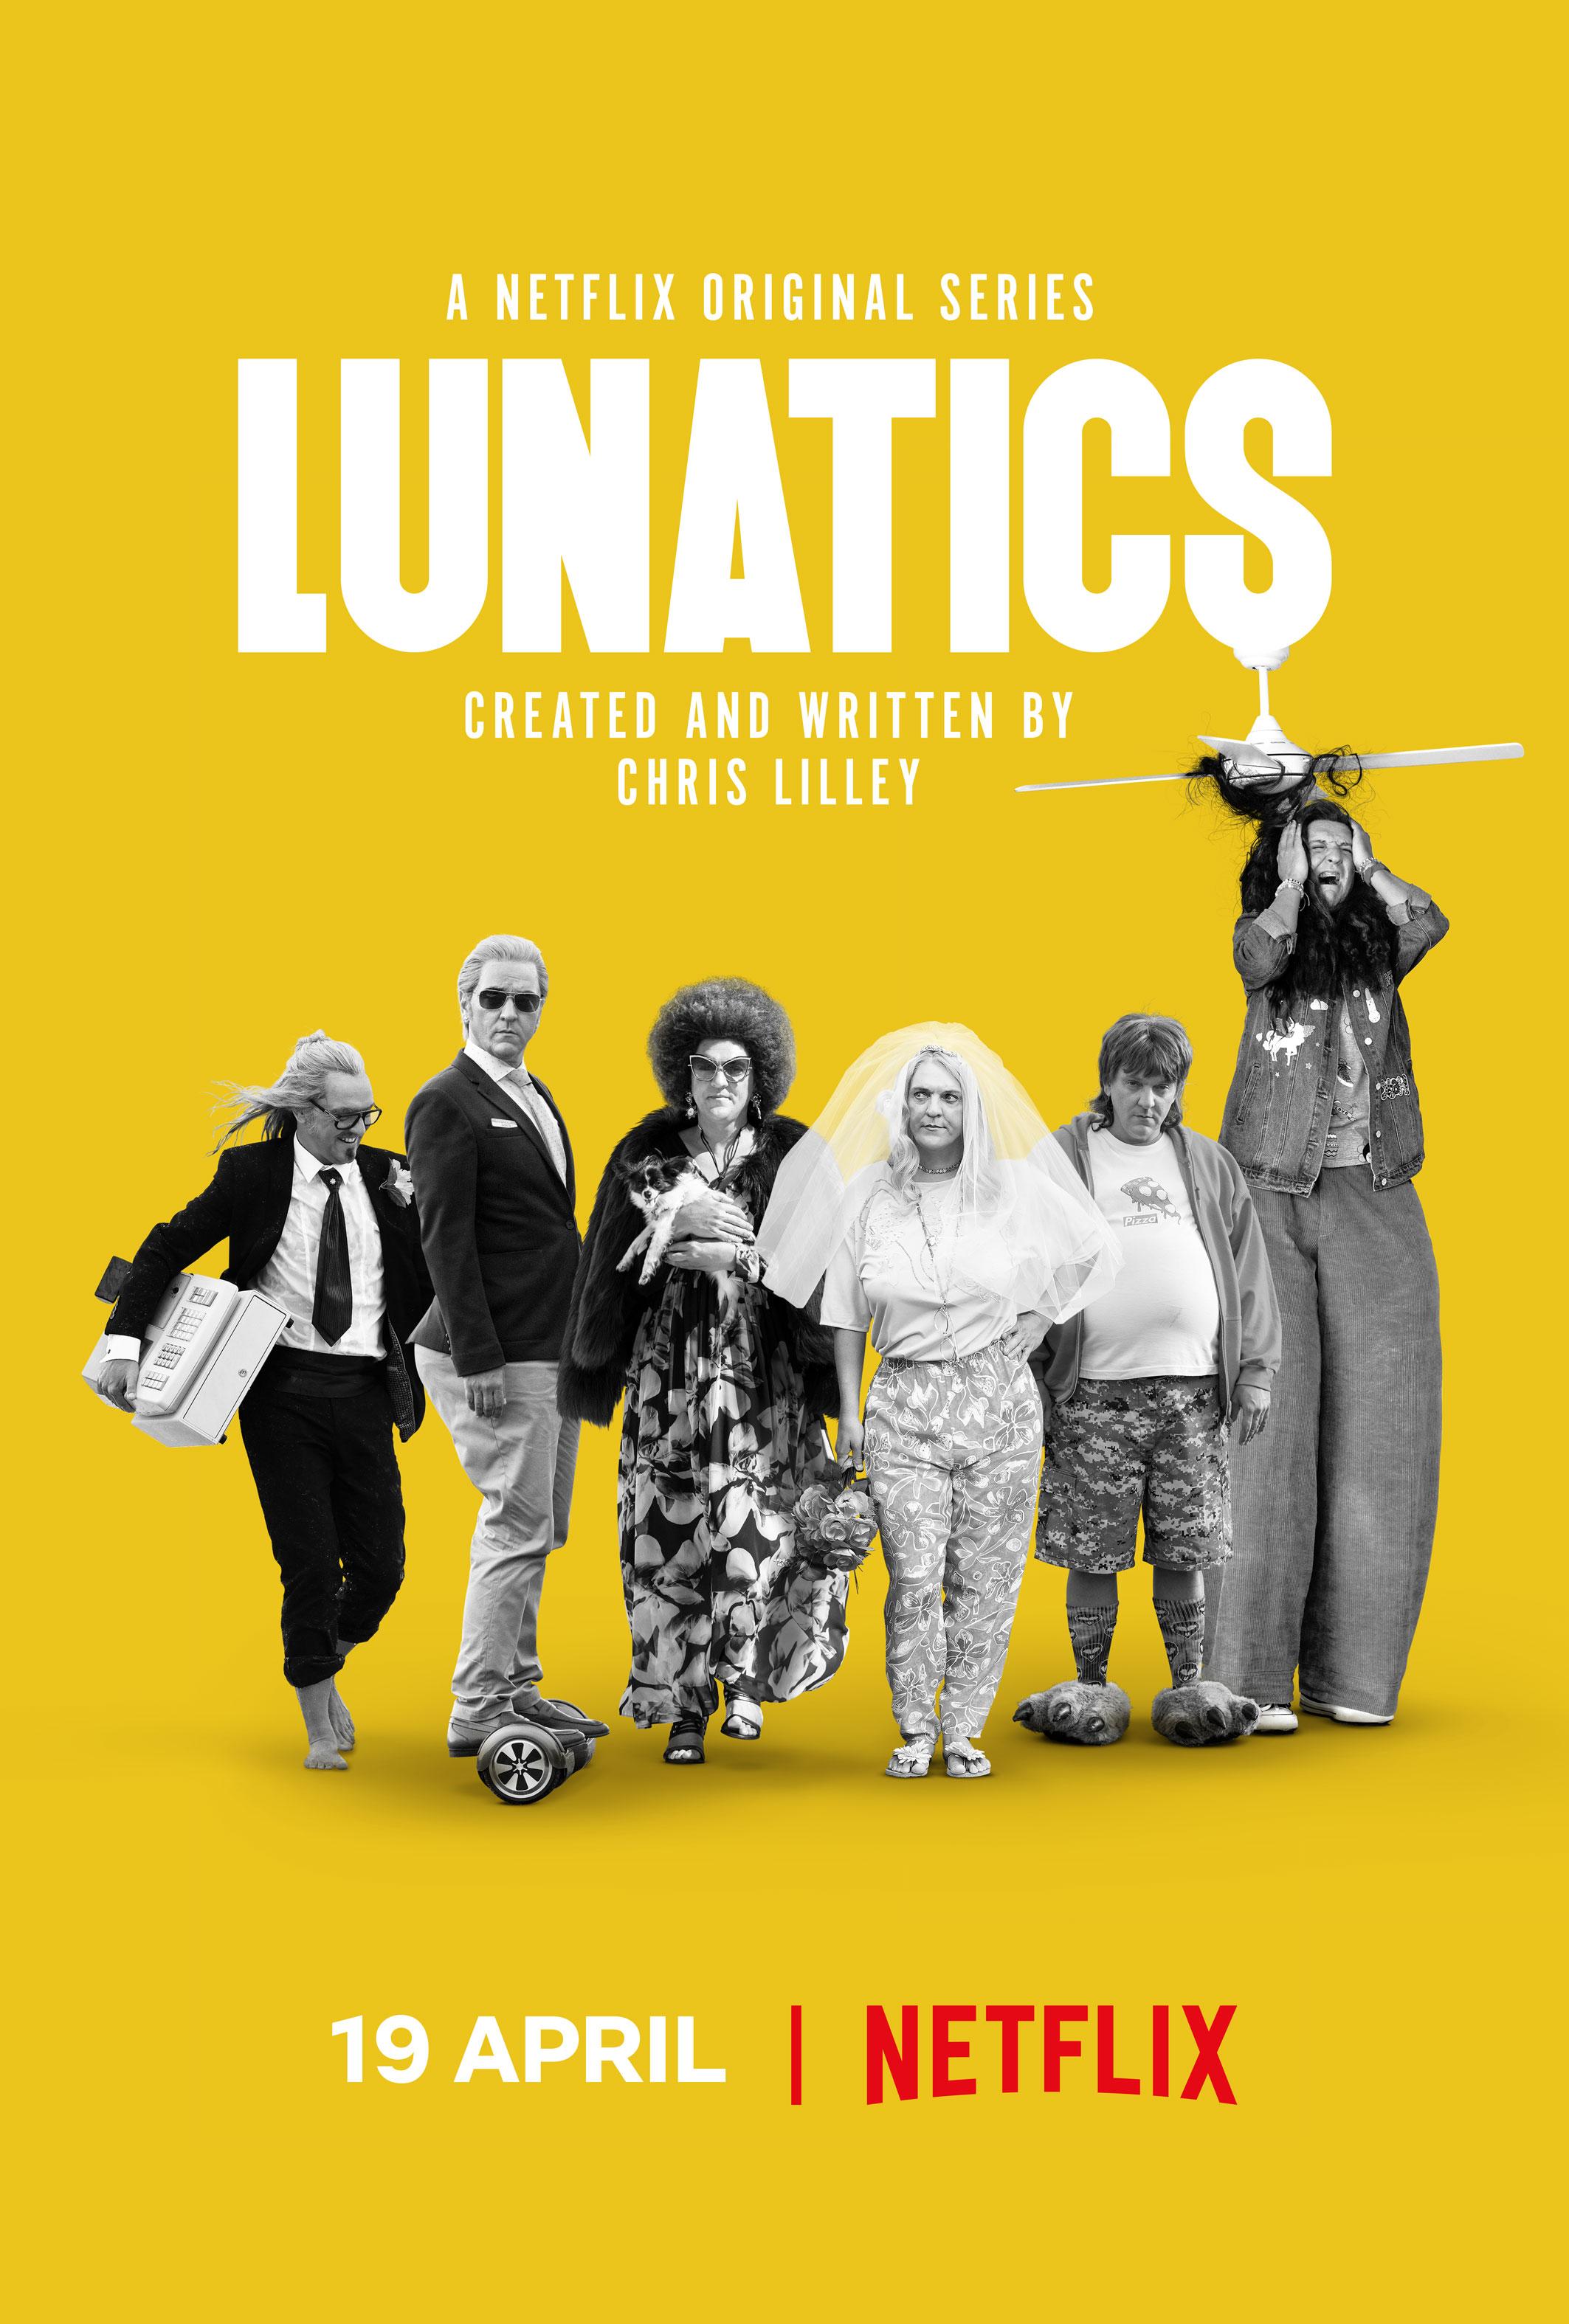 Lunatics_Vertical-Main_PRE_RGB.jpg